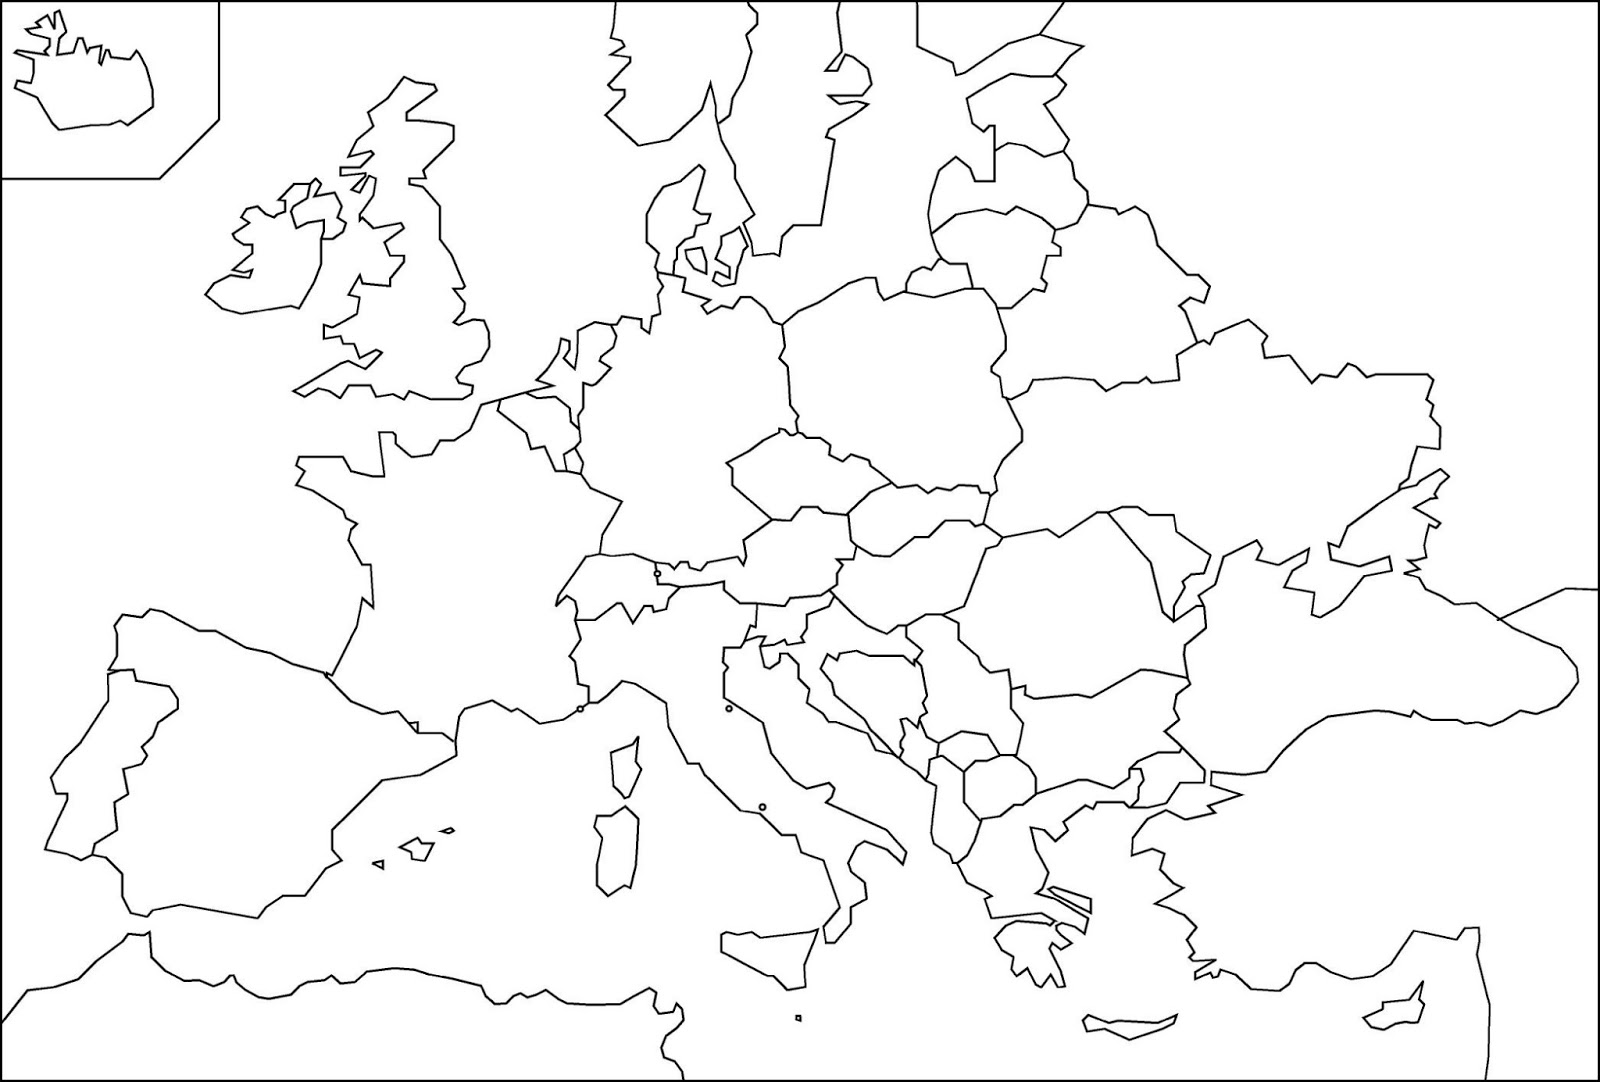 Europa Centrale Cartina Muta.Cartina Muta Europa Con Stati